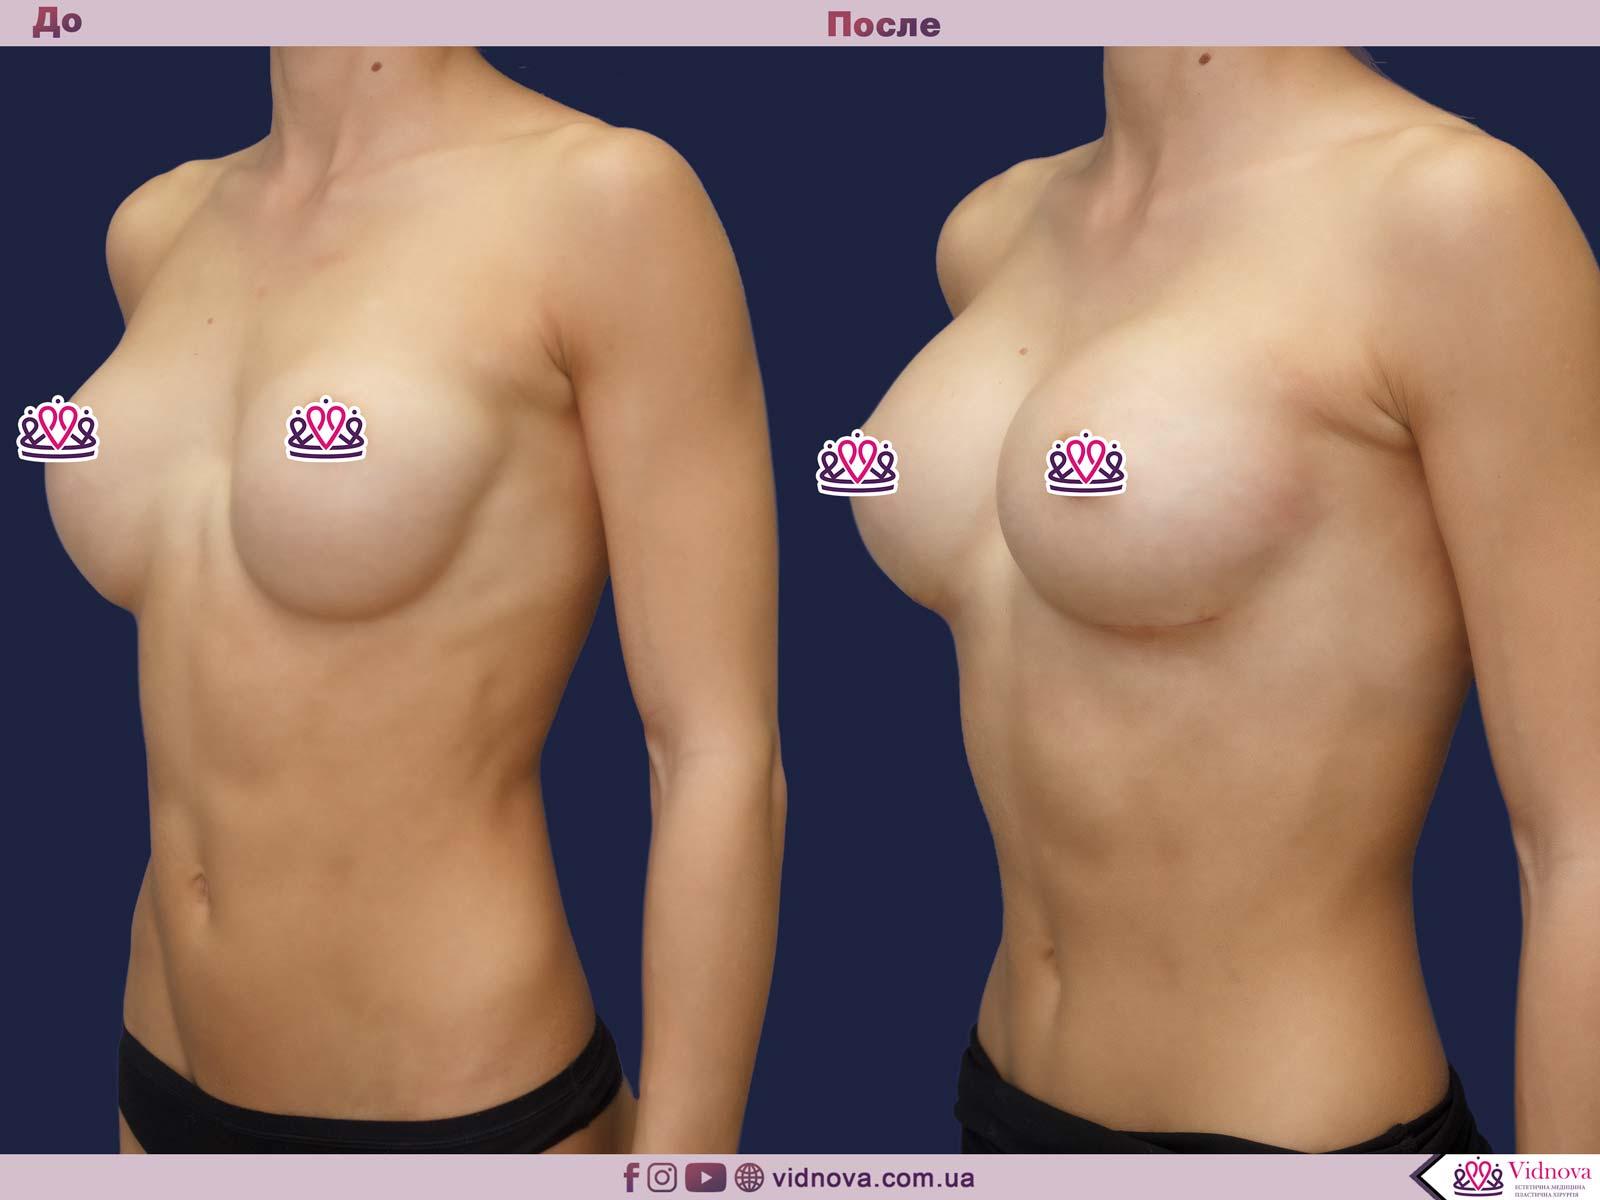 Увеличение груди: Фото ДО и ПОСЛЕ - Пример №64-2 - Клиника Vidnova